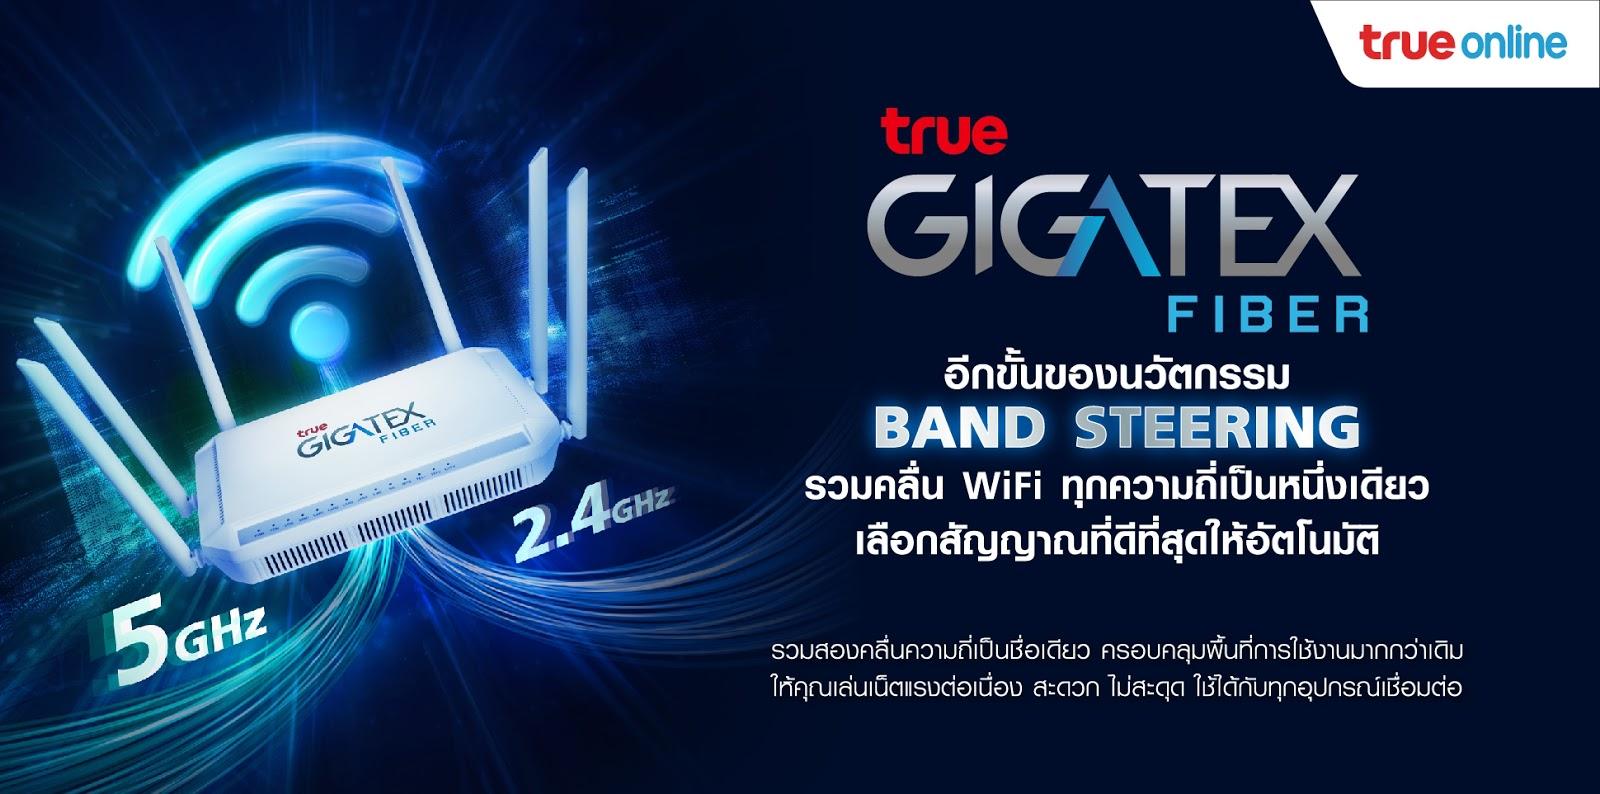 True Online ส่งตรงเน็ตไฟเบอร์ True Gigatex Smart Plus 1,000 Mbps คอมโบแพ็ก ใหม่  เริ่มเพียง 599 บาท/เดือน พร้อมปรับเพิ่มสปีดให้ลูกค้าอัตโนมัติ